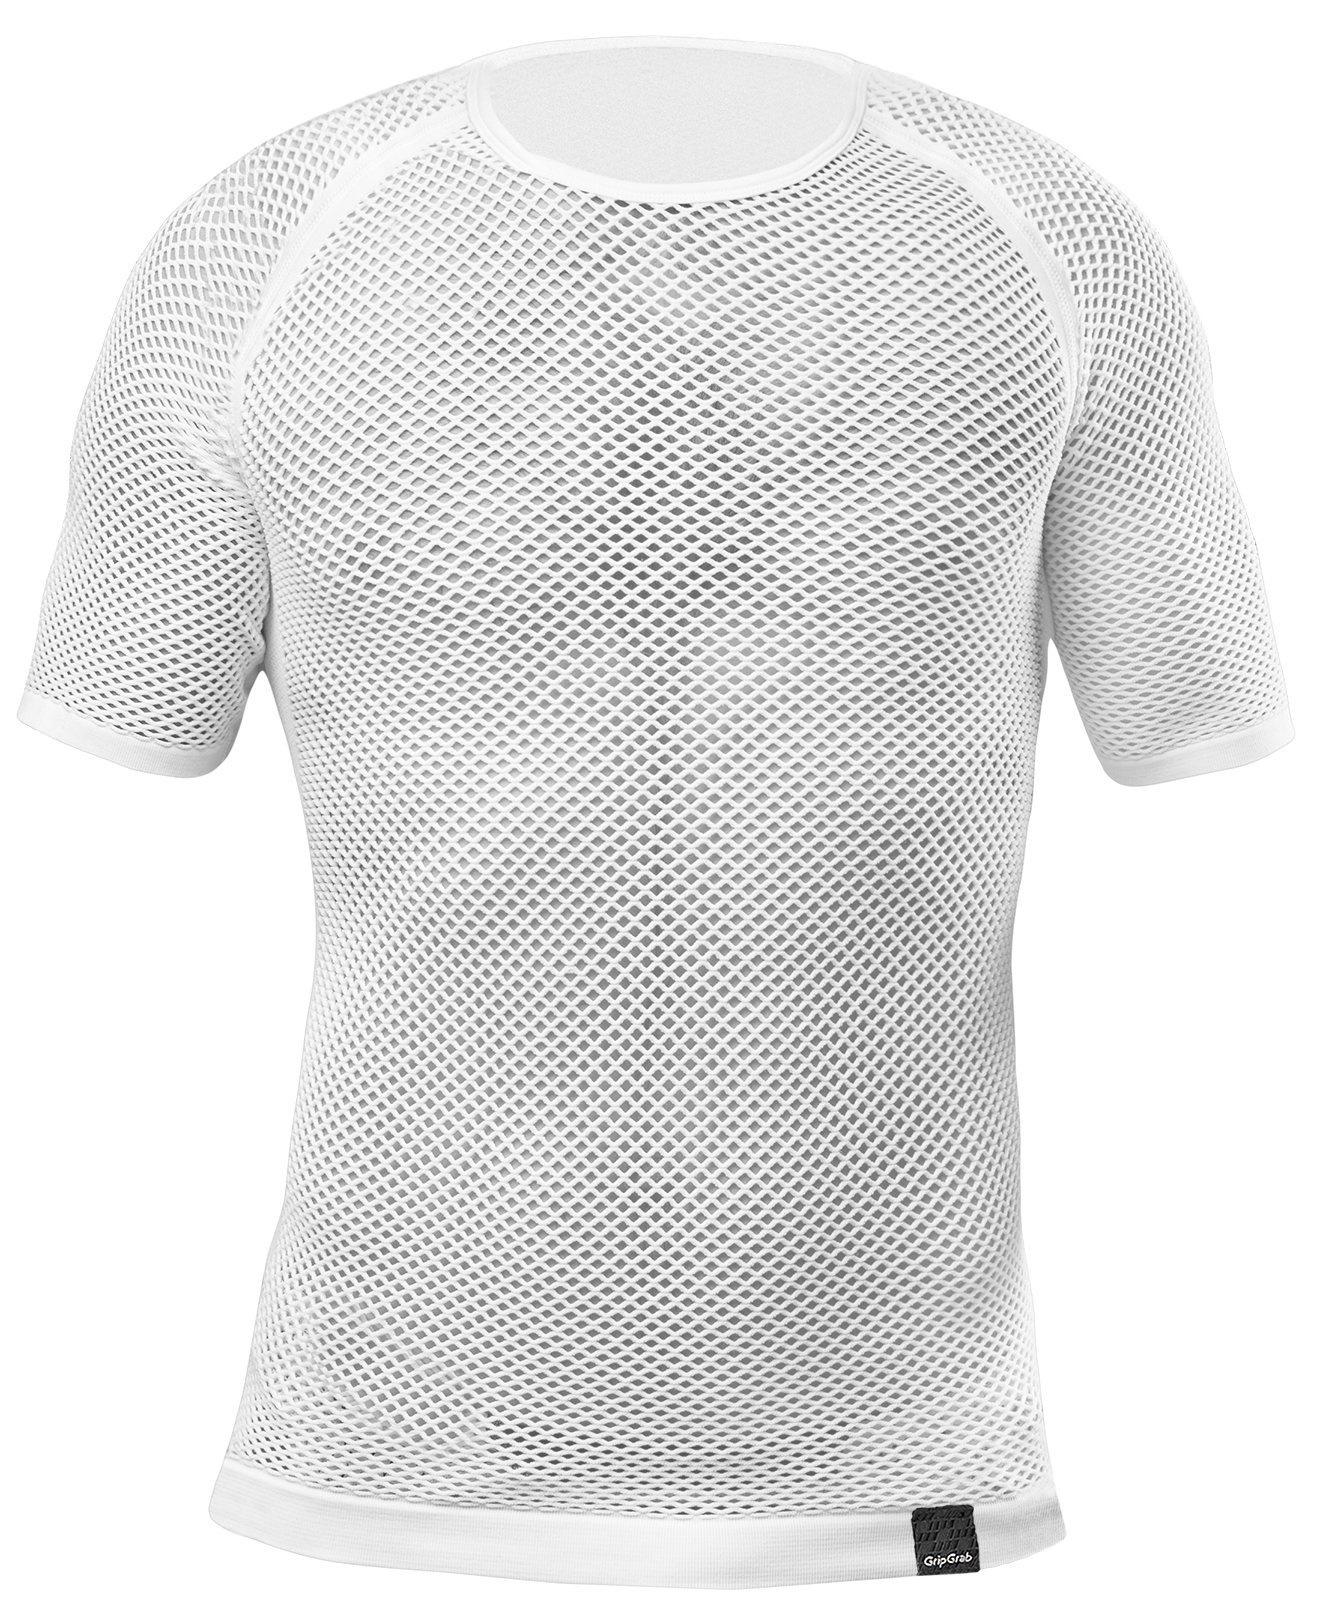 GripGrab 3-Season Short Sleeve Baselayer - Hvid